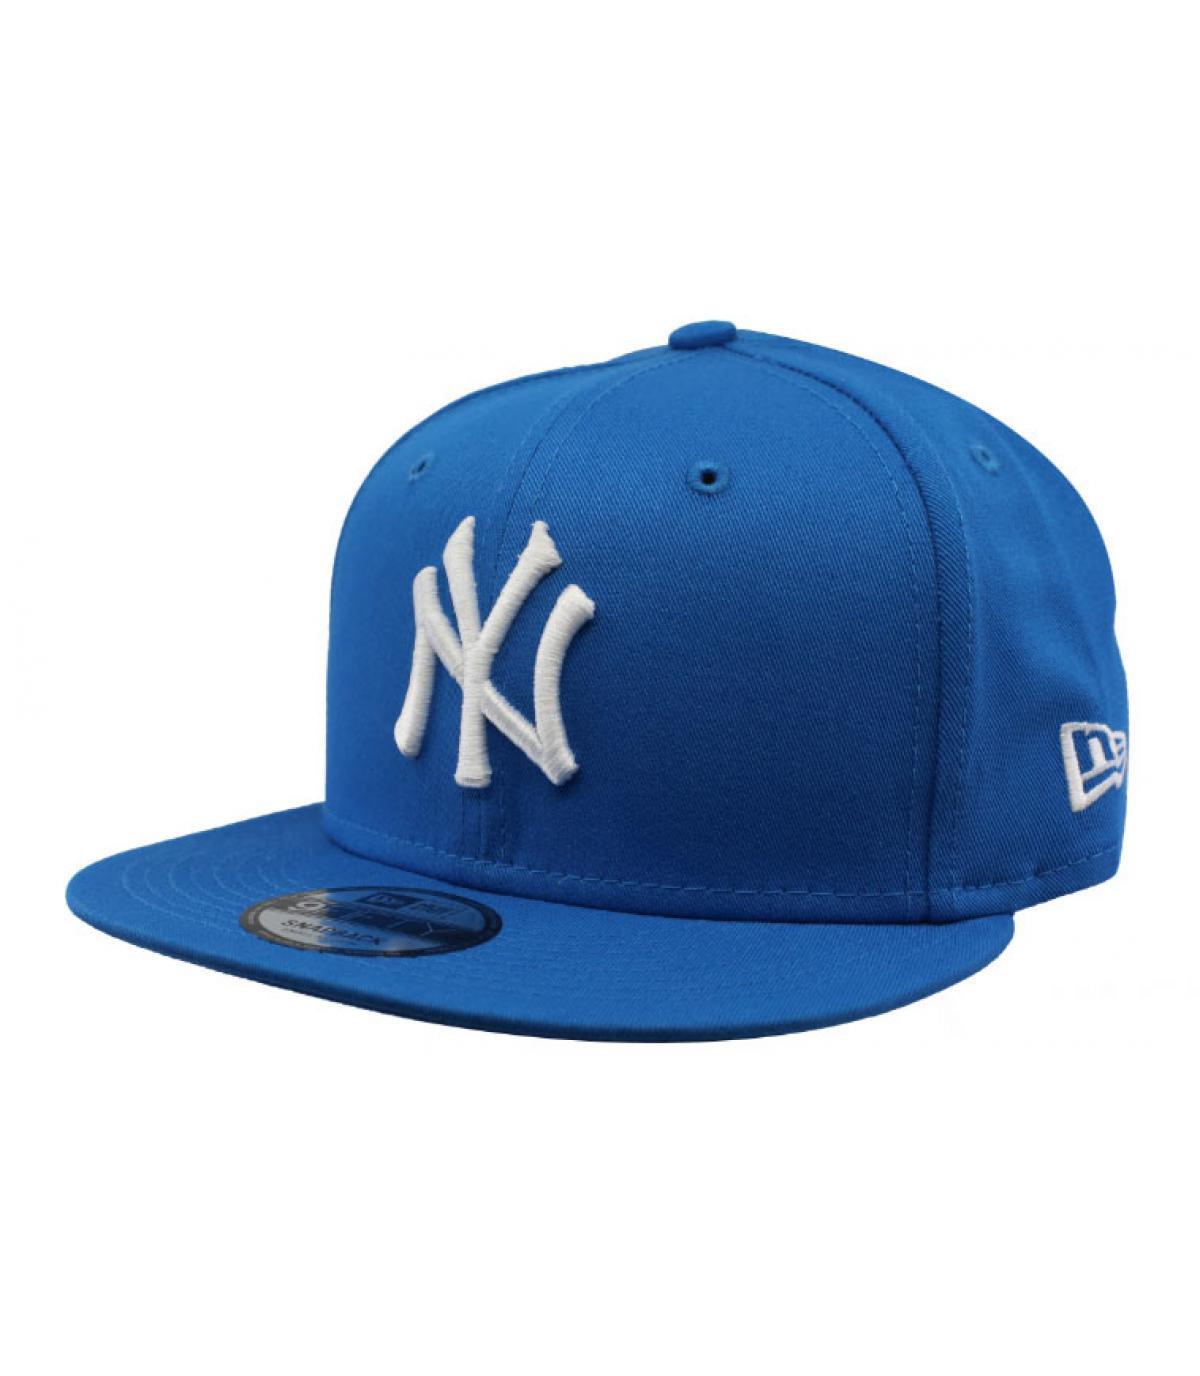 snapback NY blau weiß